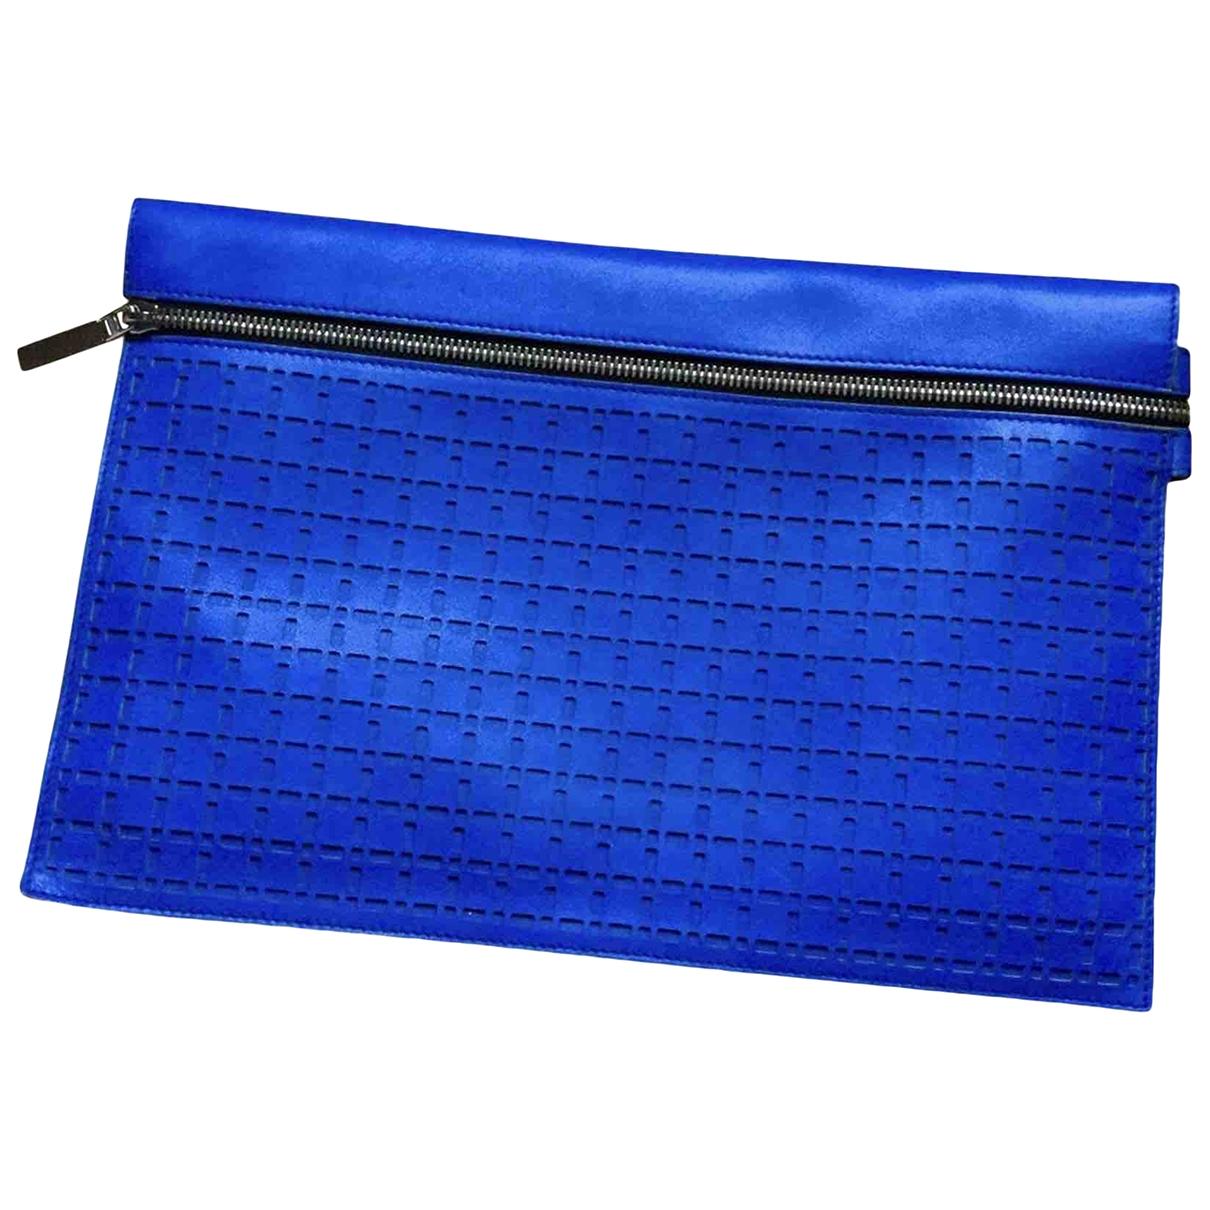 Victoria Beckham \N Blue Leather Clutch bag for Women \N